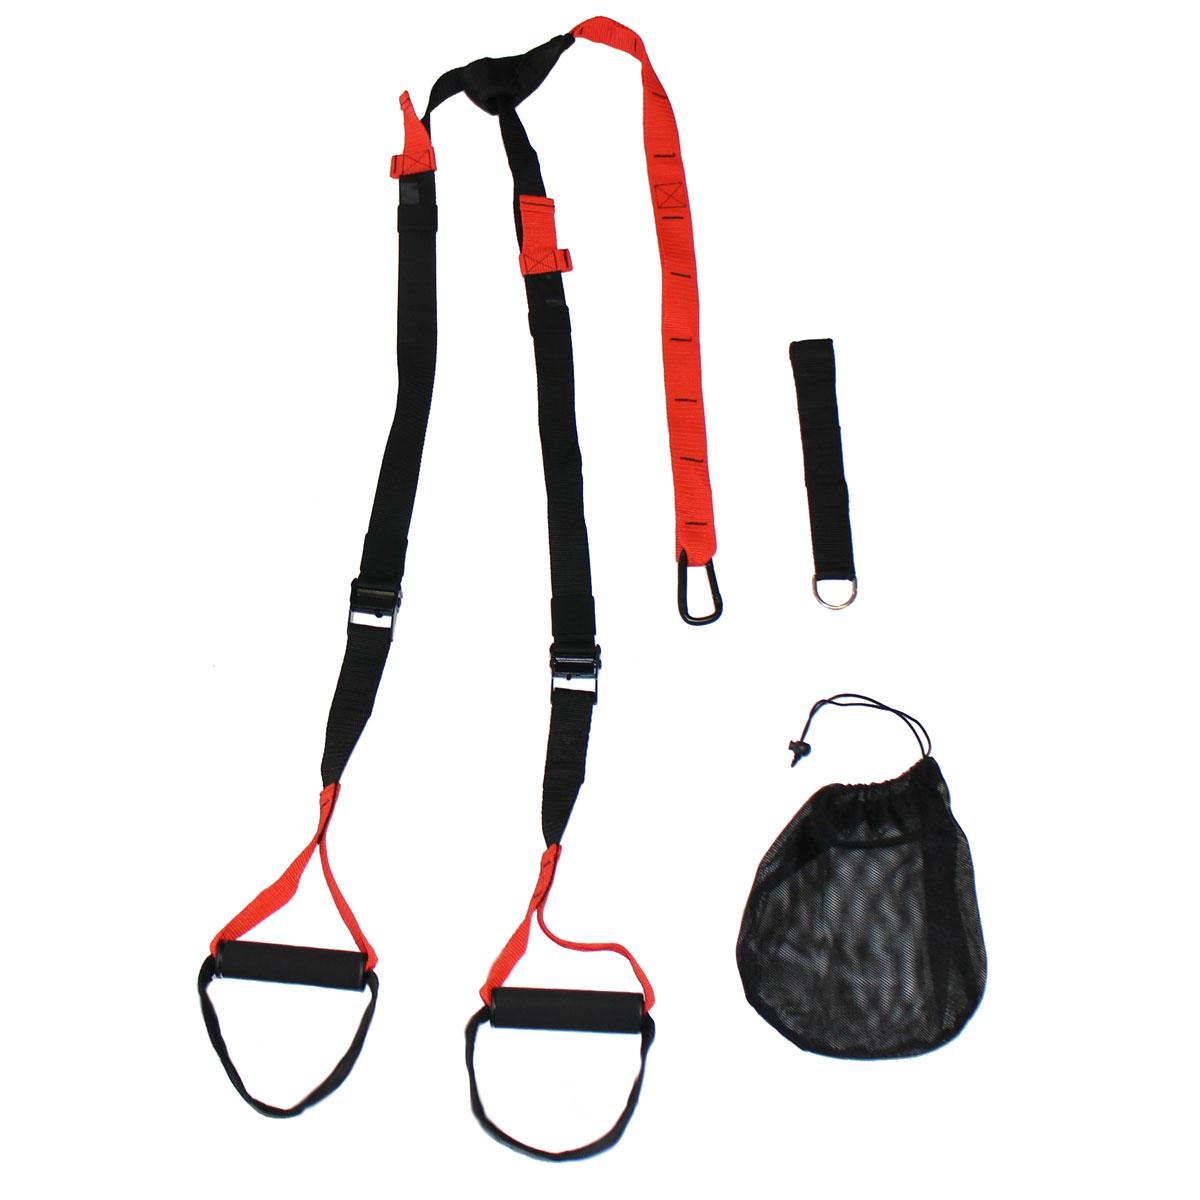 X Training Equipment® Suspension Training Kit - Home Gym Trainer